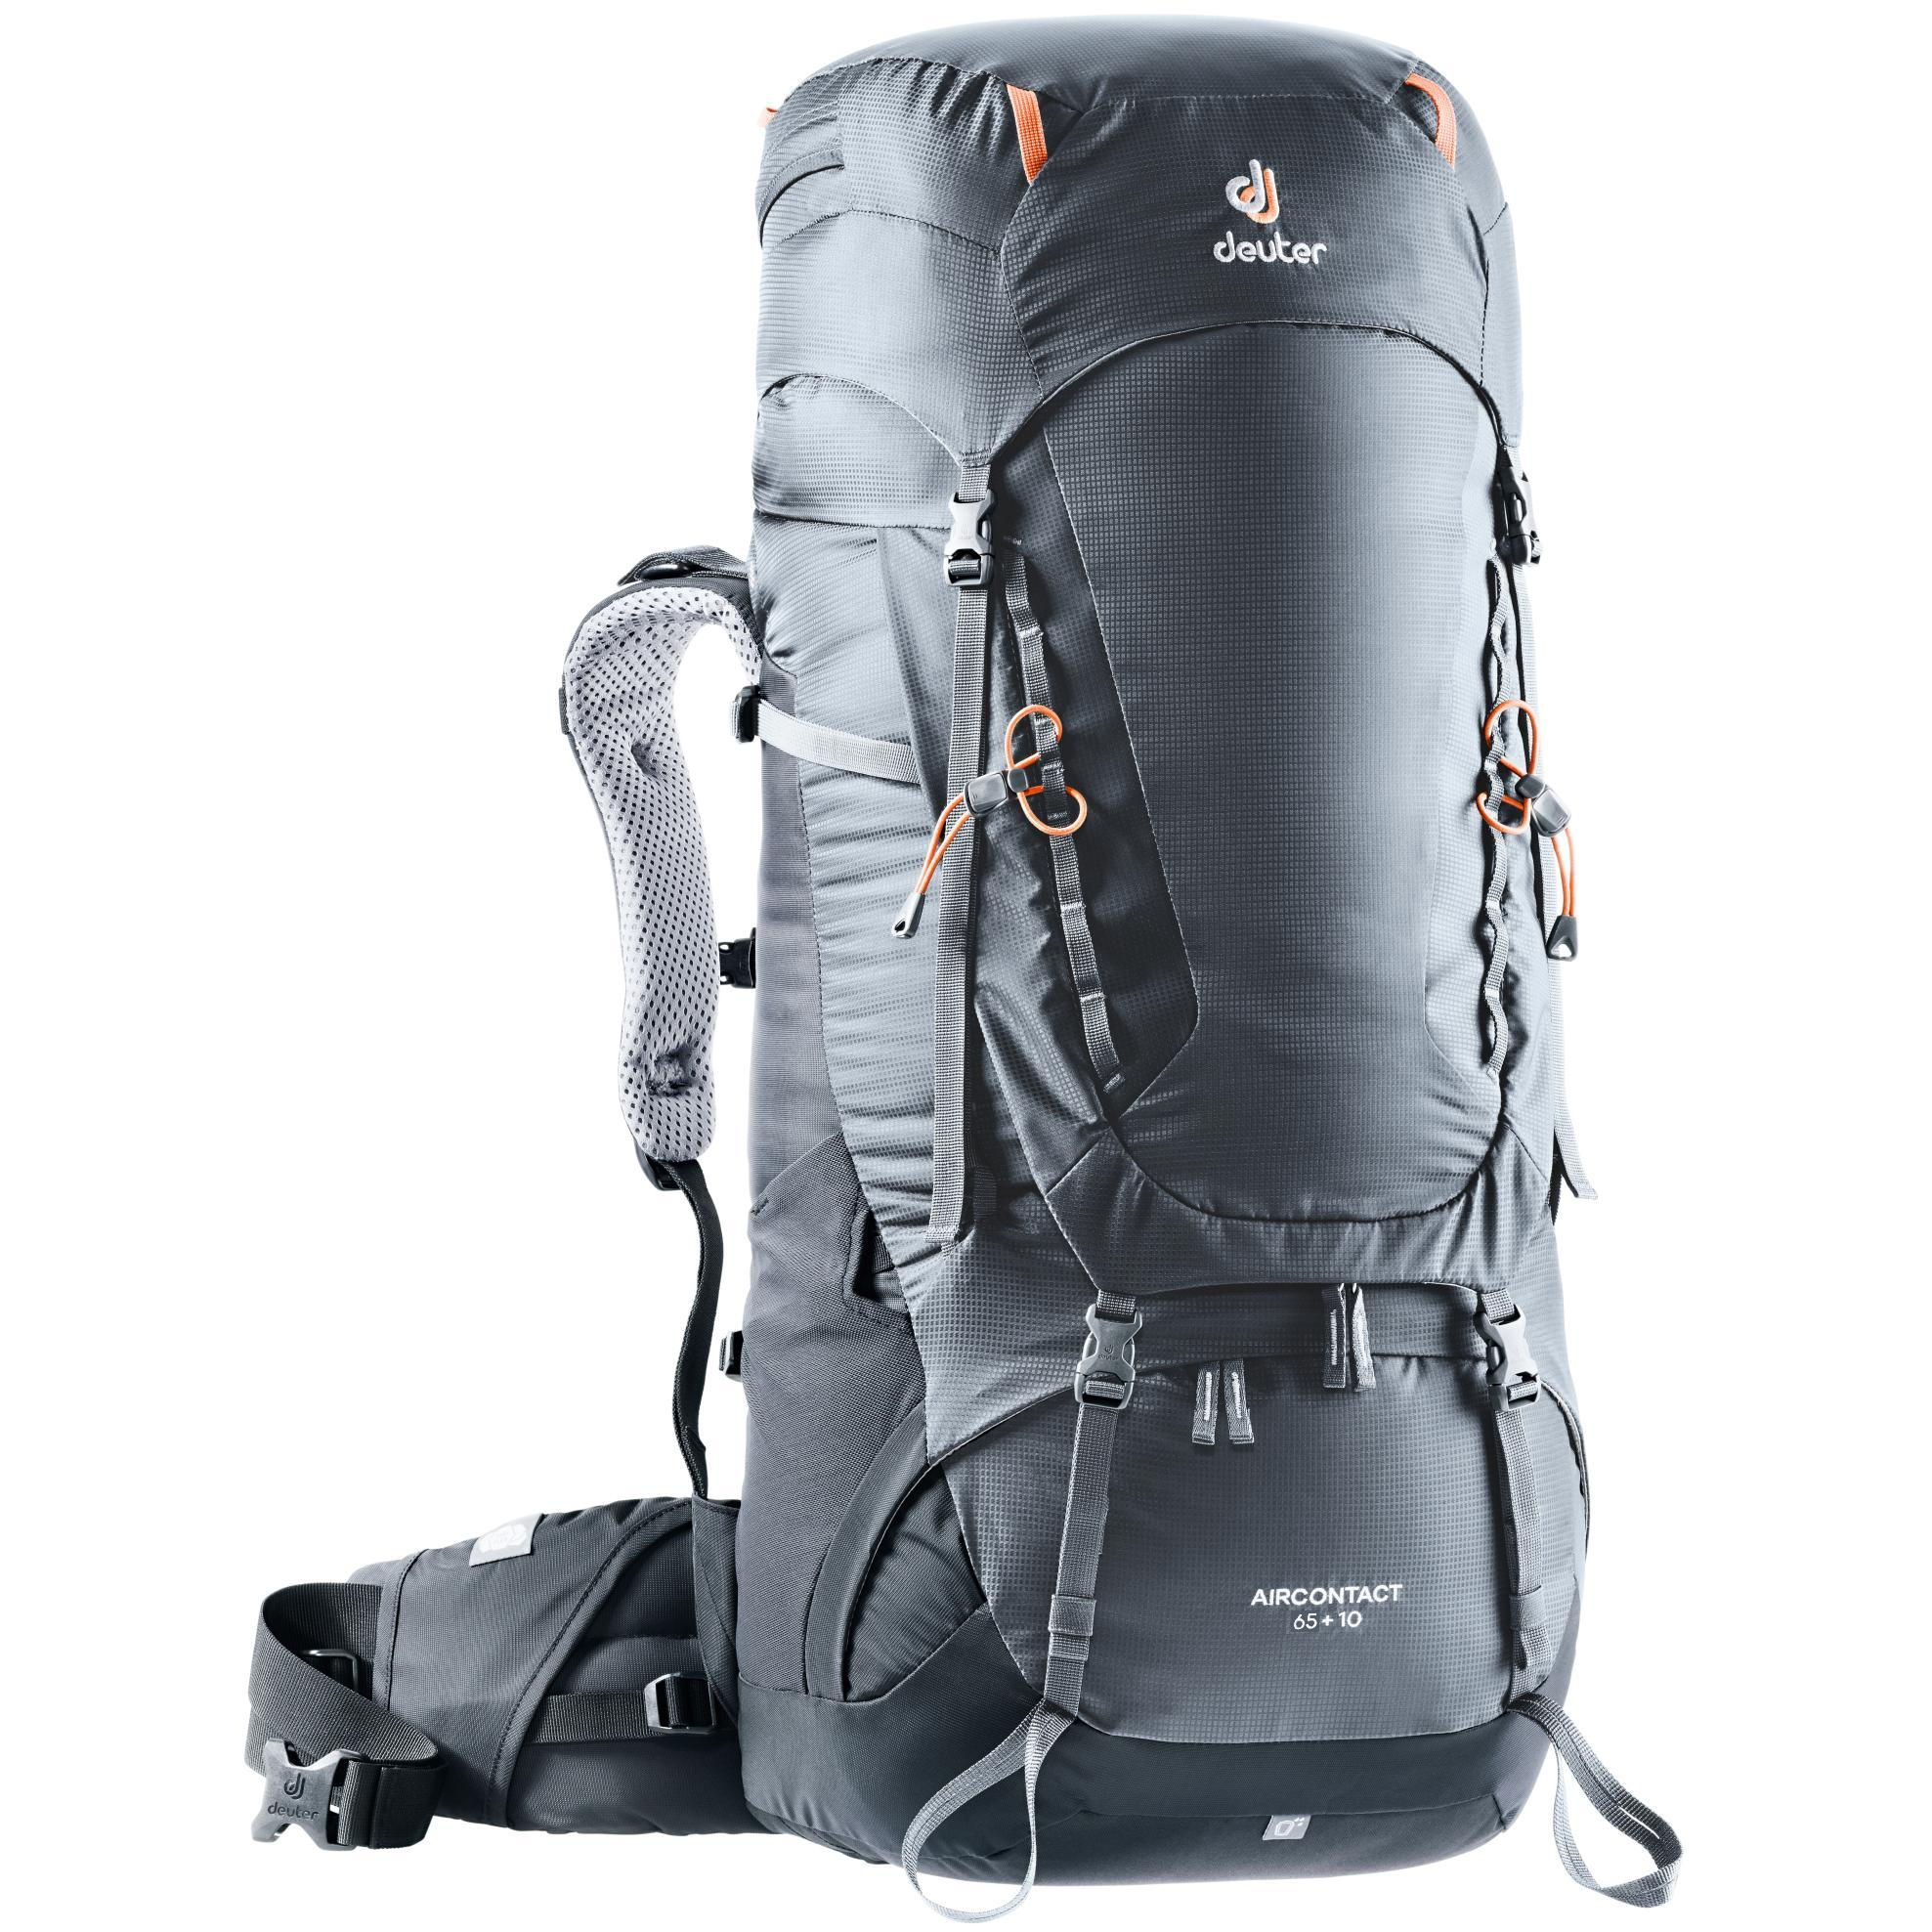 Туристические рюкзаки большие Рюкзак Deuter Aircontact 65 + 10 (2020) ec0da6aa62c2b9fbd72e97a2cdf90c75.jpg